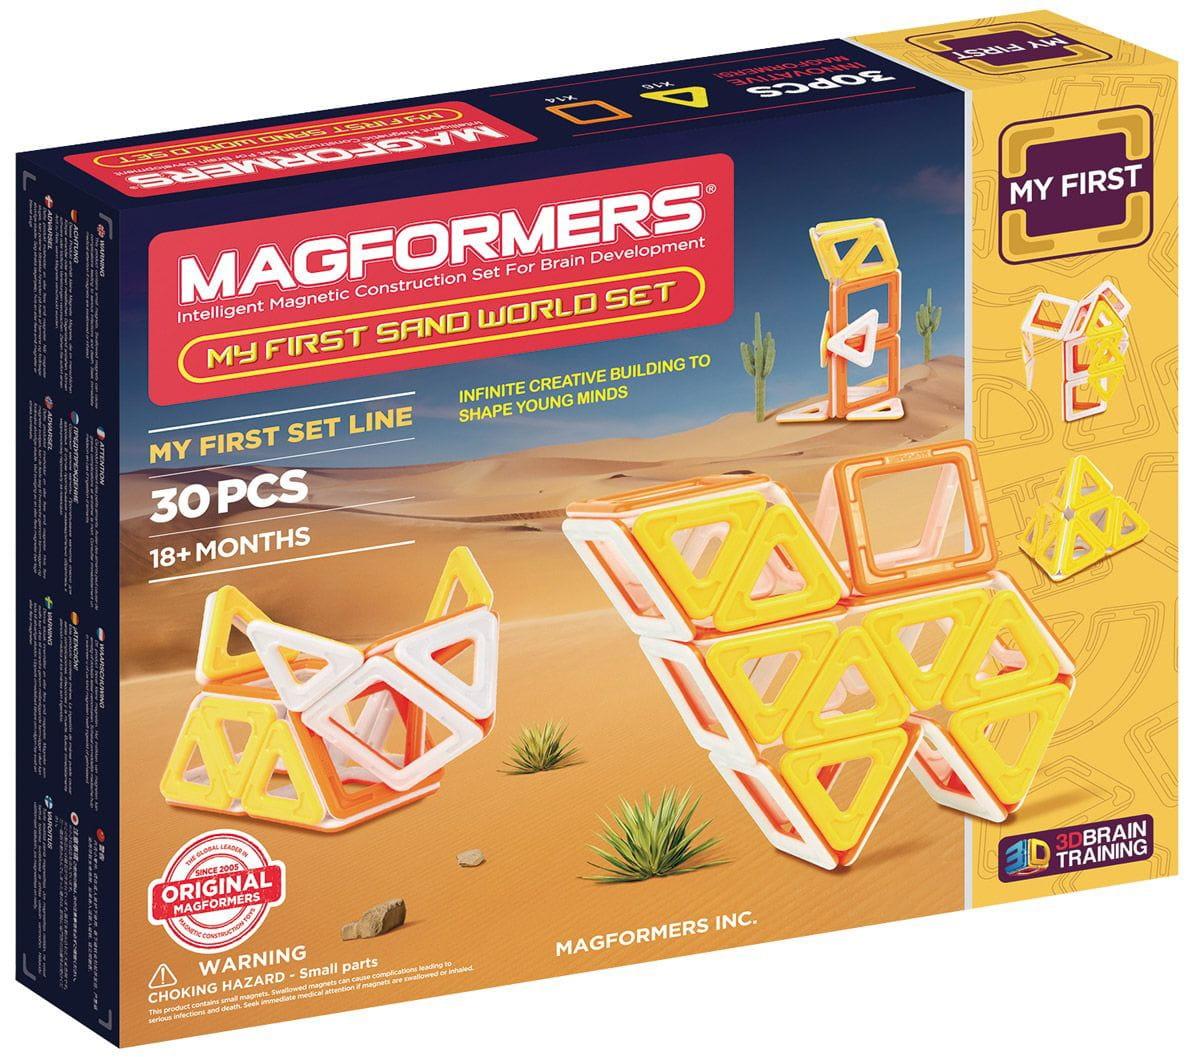 Магнитный конструктор Magformers 702010 My First Sand World (30 деталей)